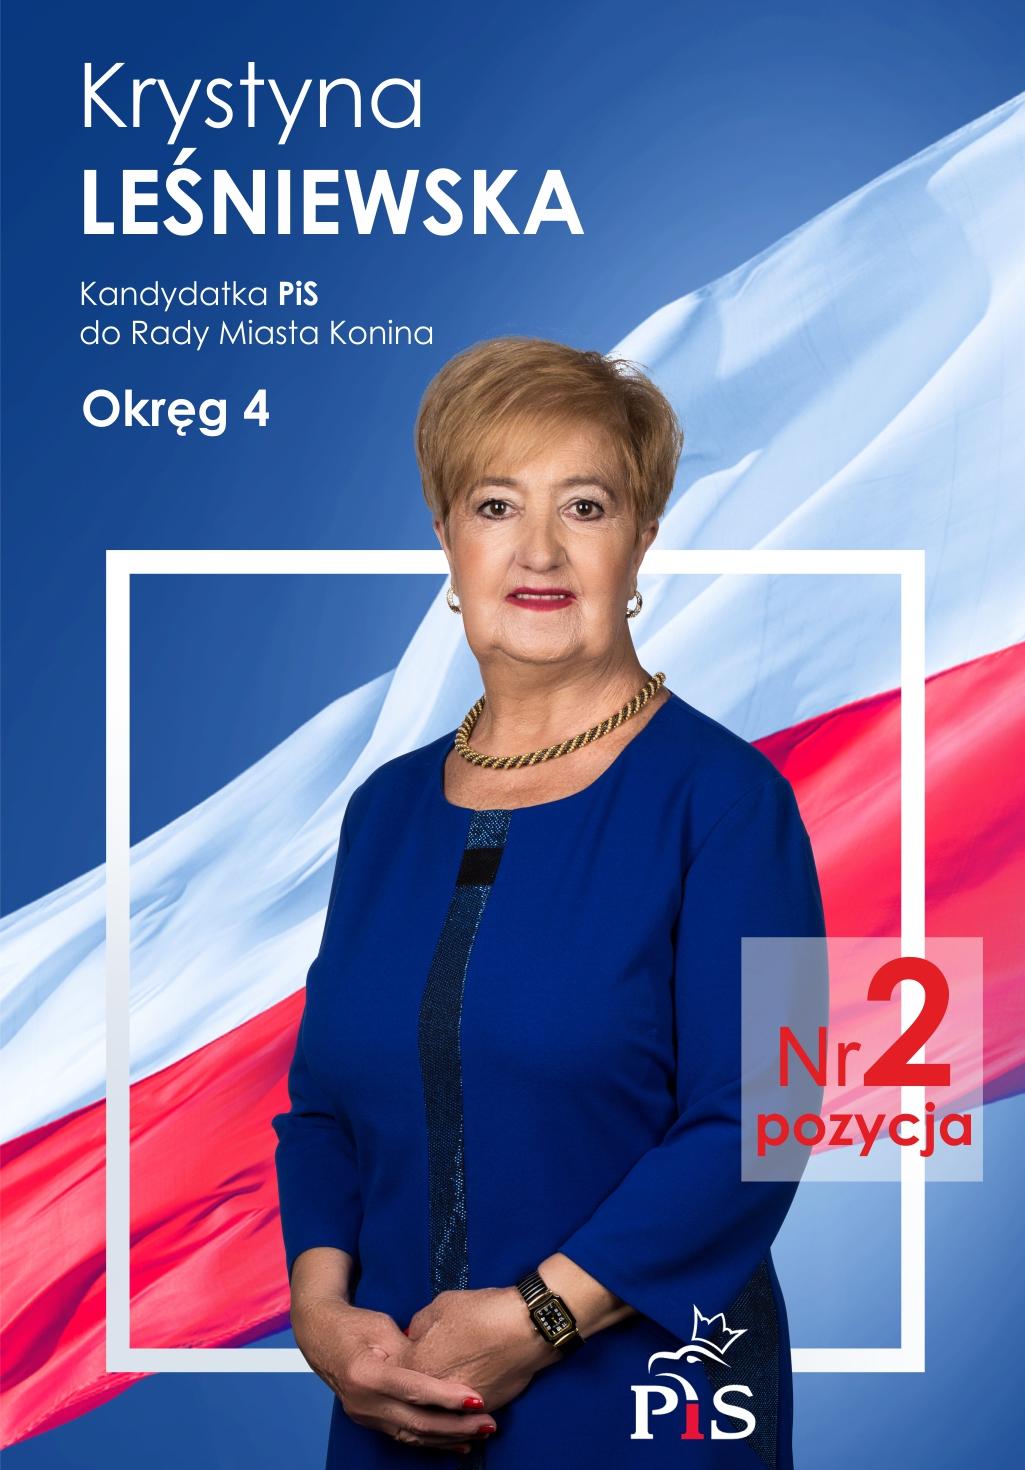 Konin Lesniewska WS2018